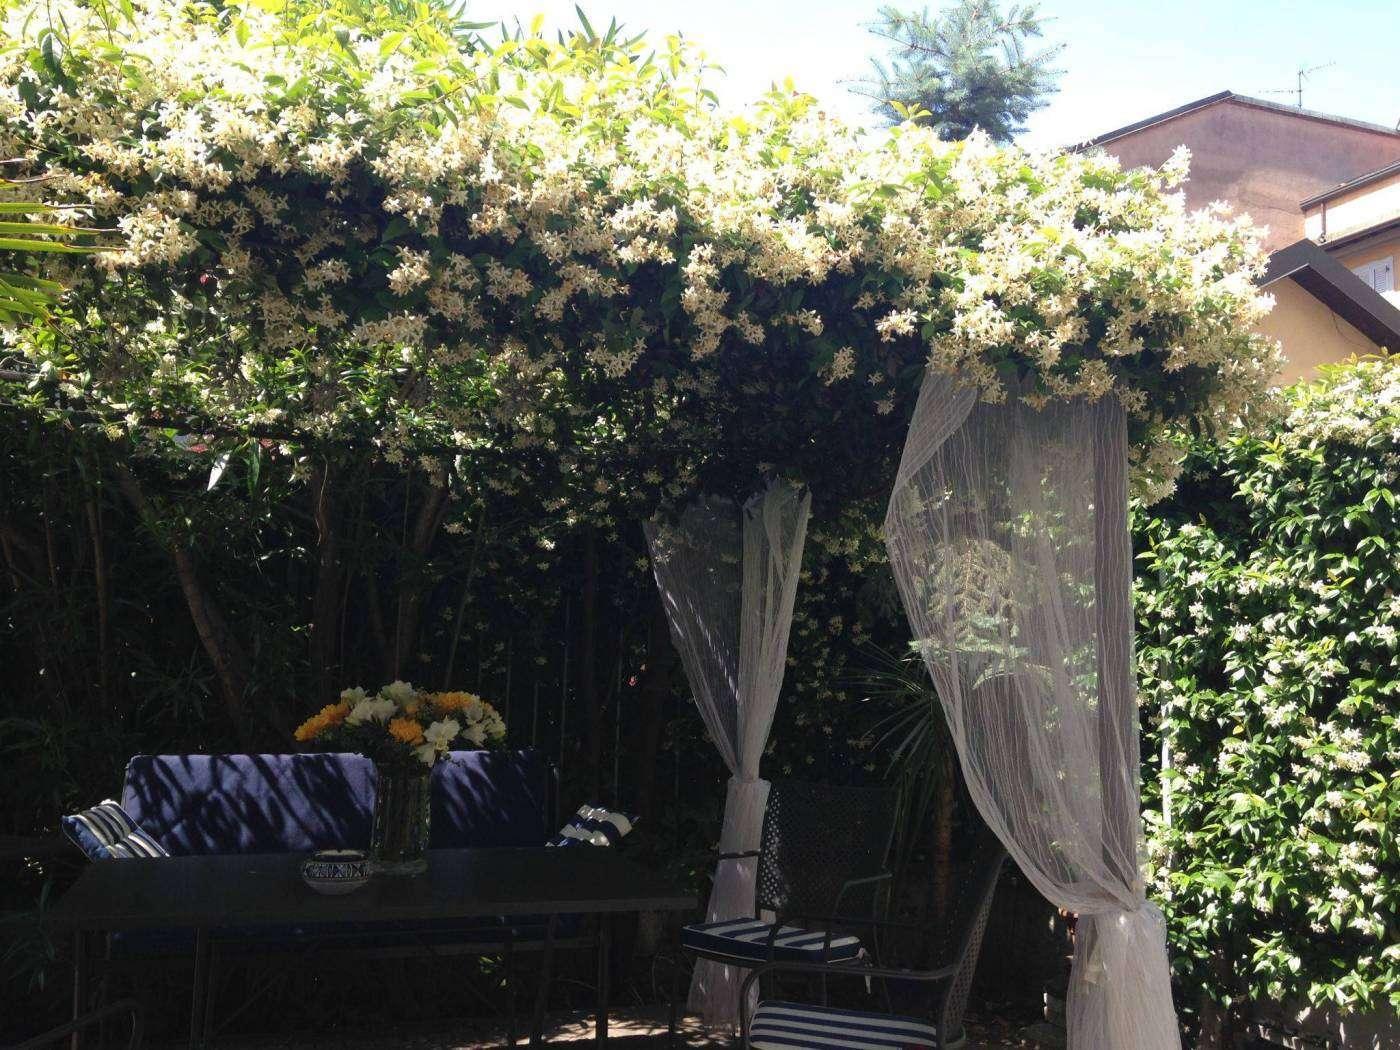 giardino fiorito loft